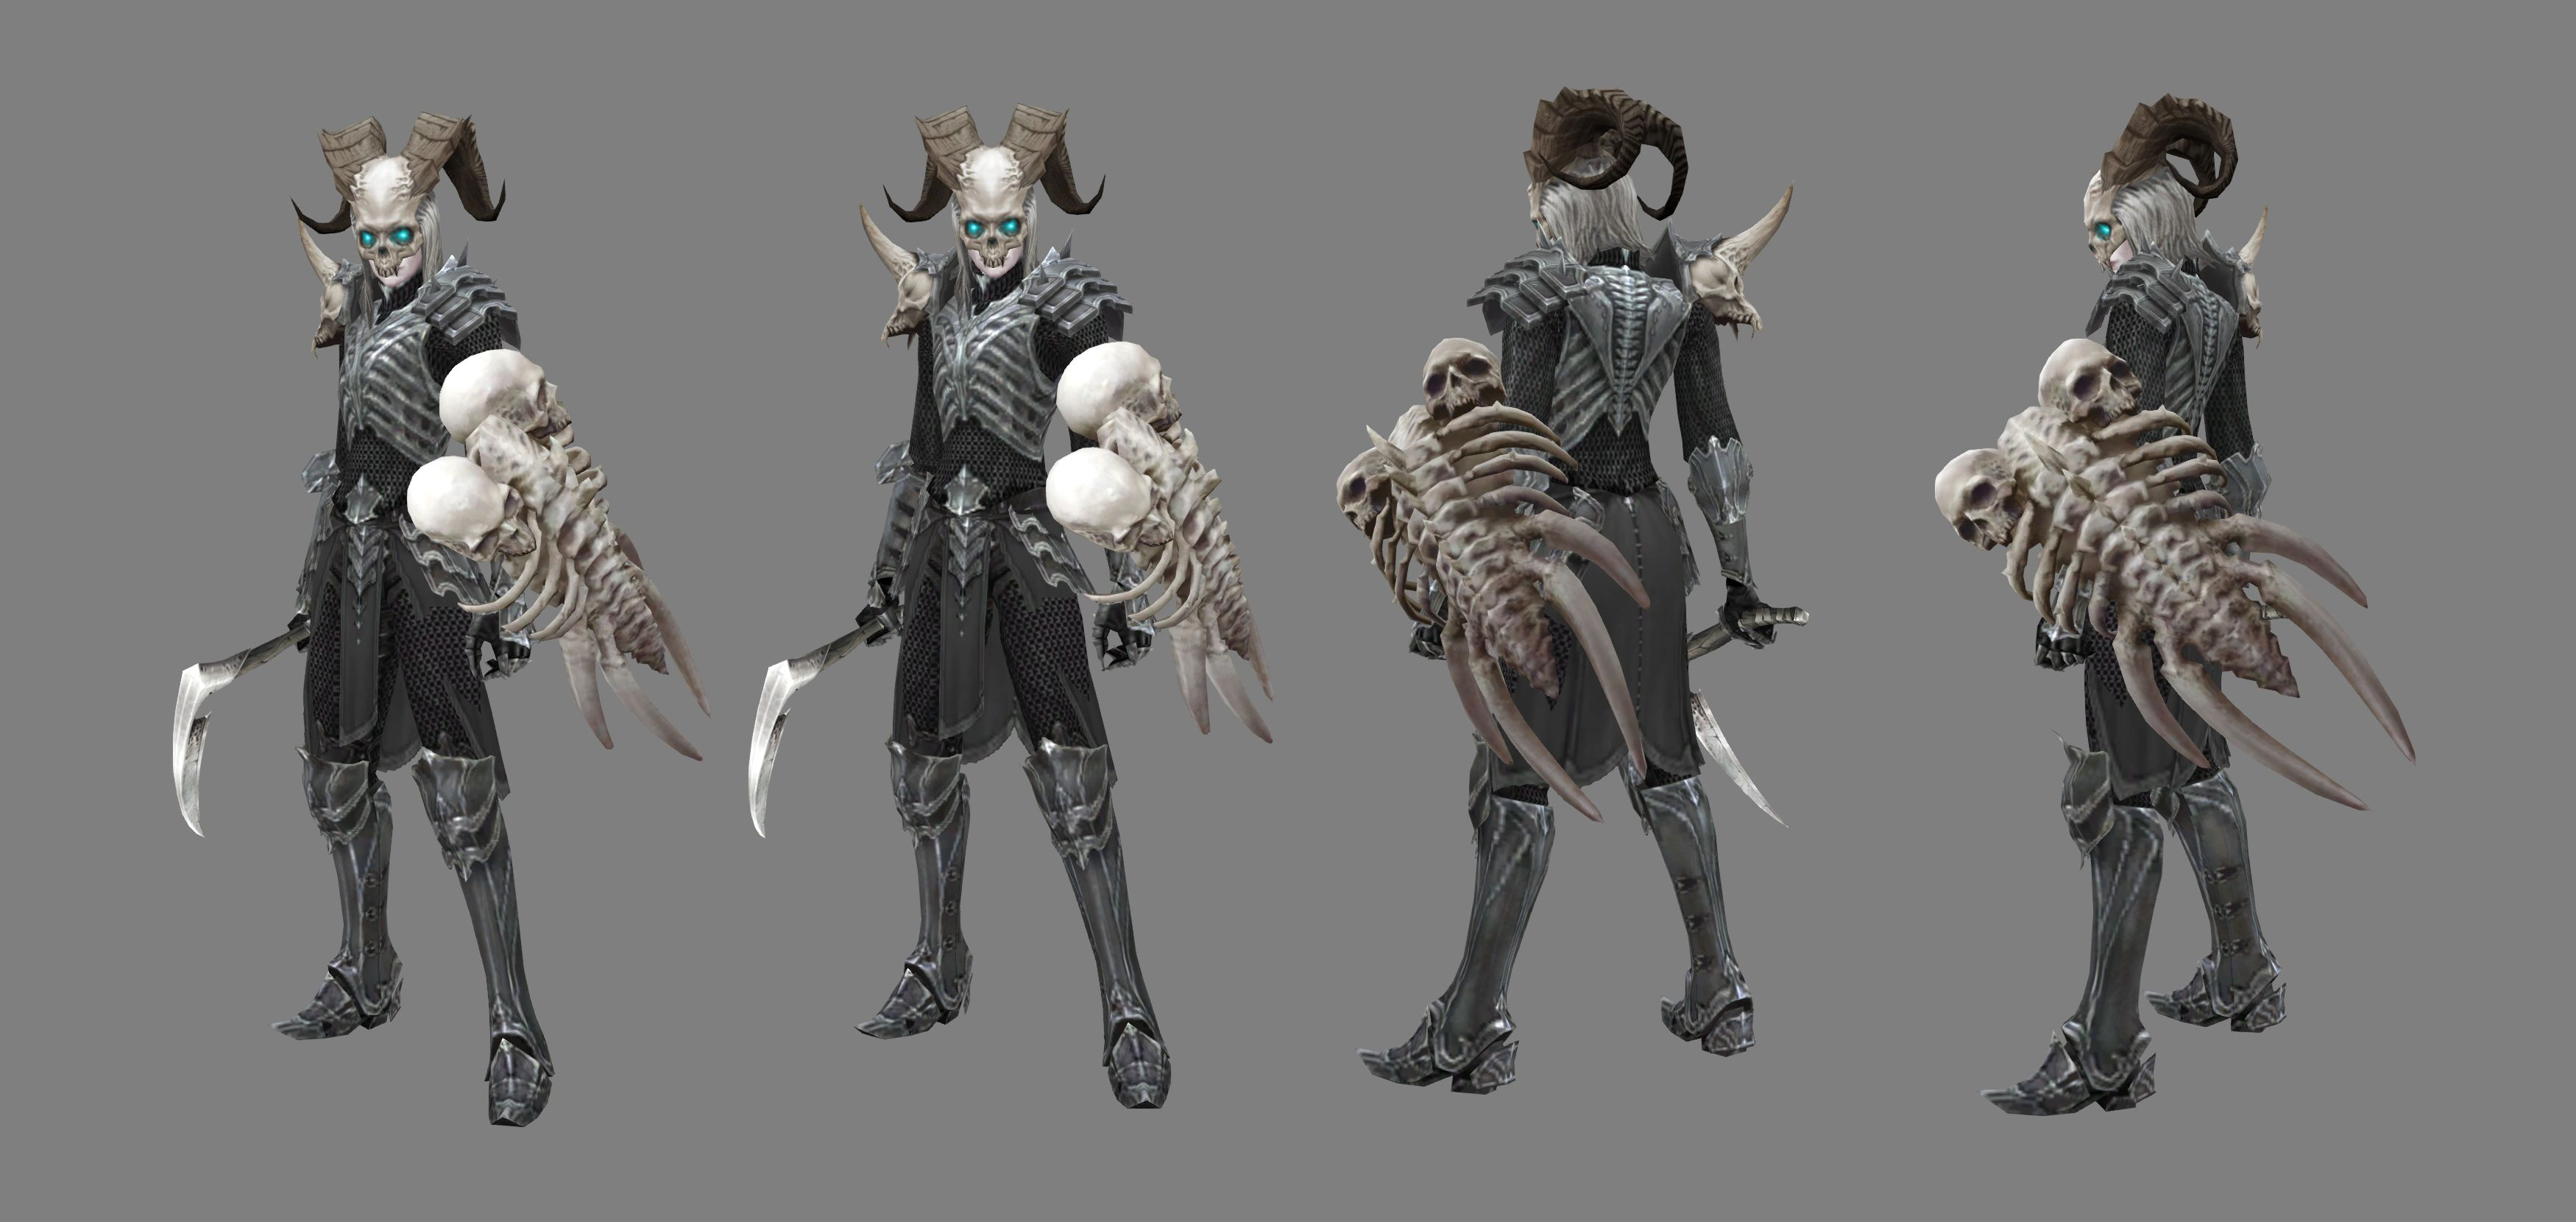 Co dokáže Necromancer v Diablu 3? Podívejte se 140196